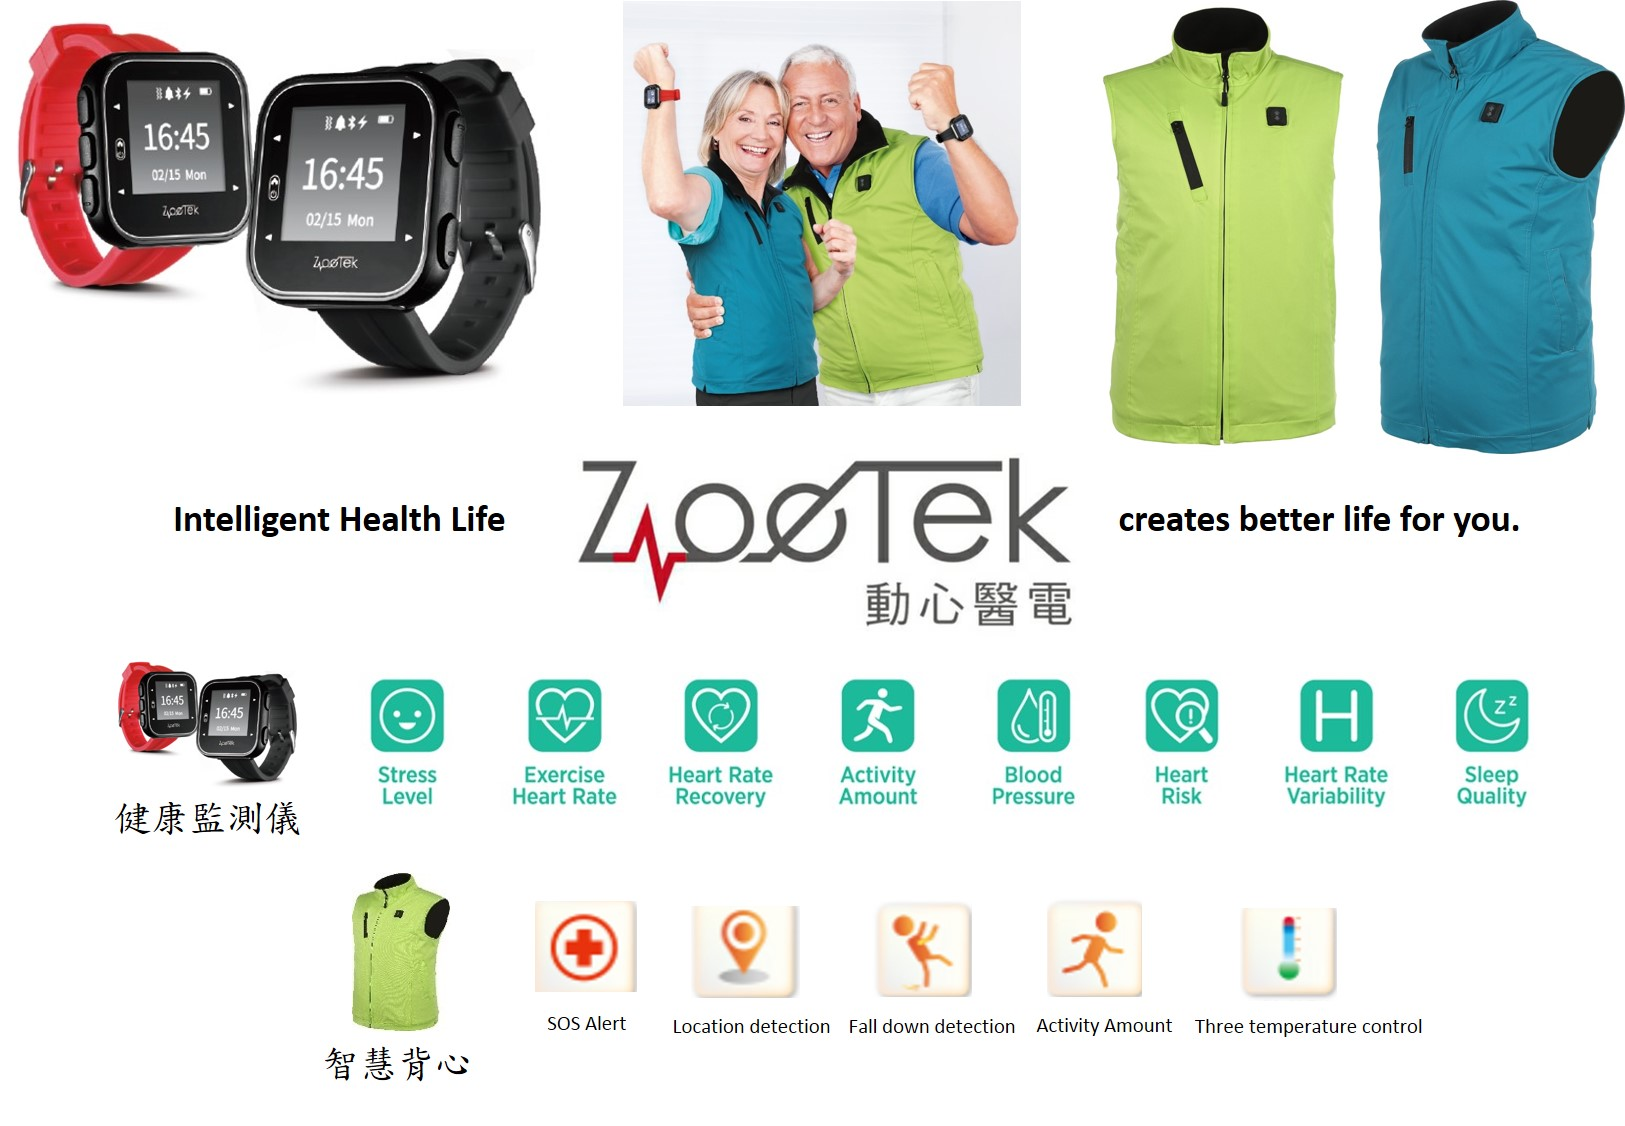 Zoetek,Intelligent Health Life,creates better life for you.